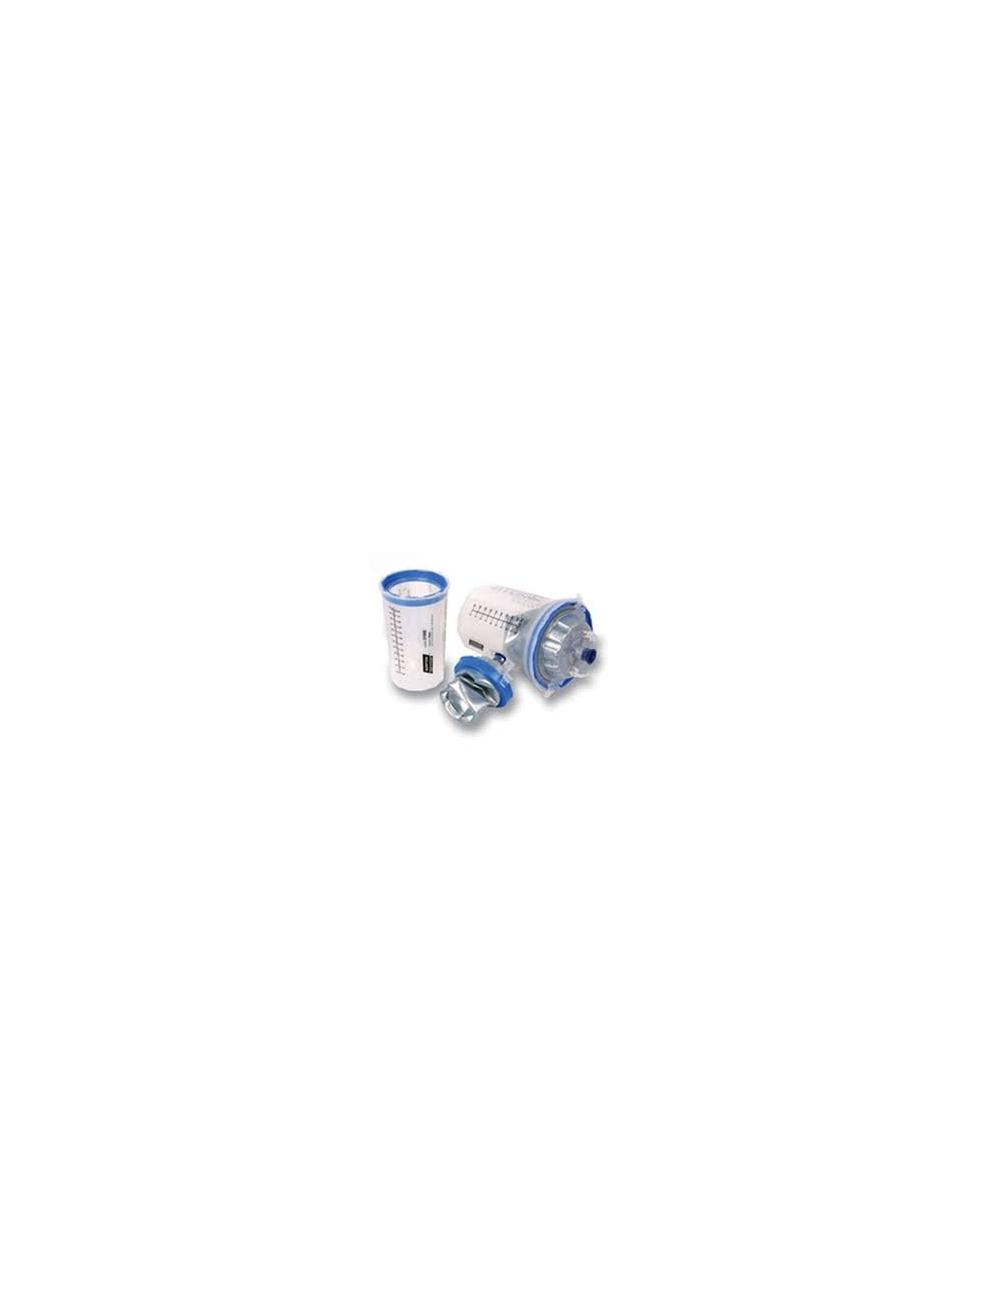 48 NEW GPS Kit small 250 ml 190 µ